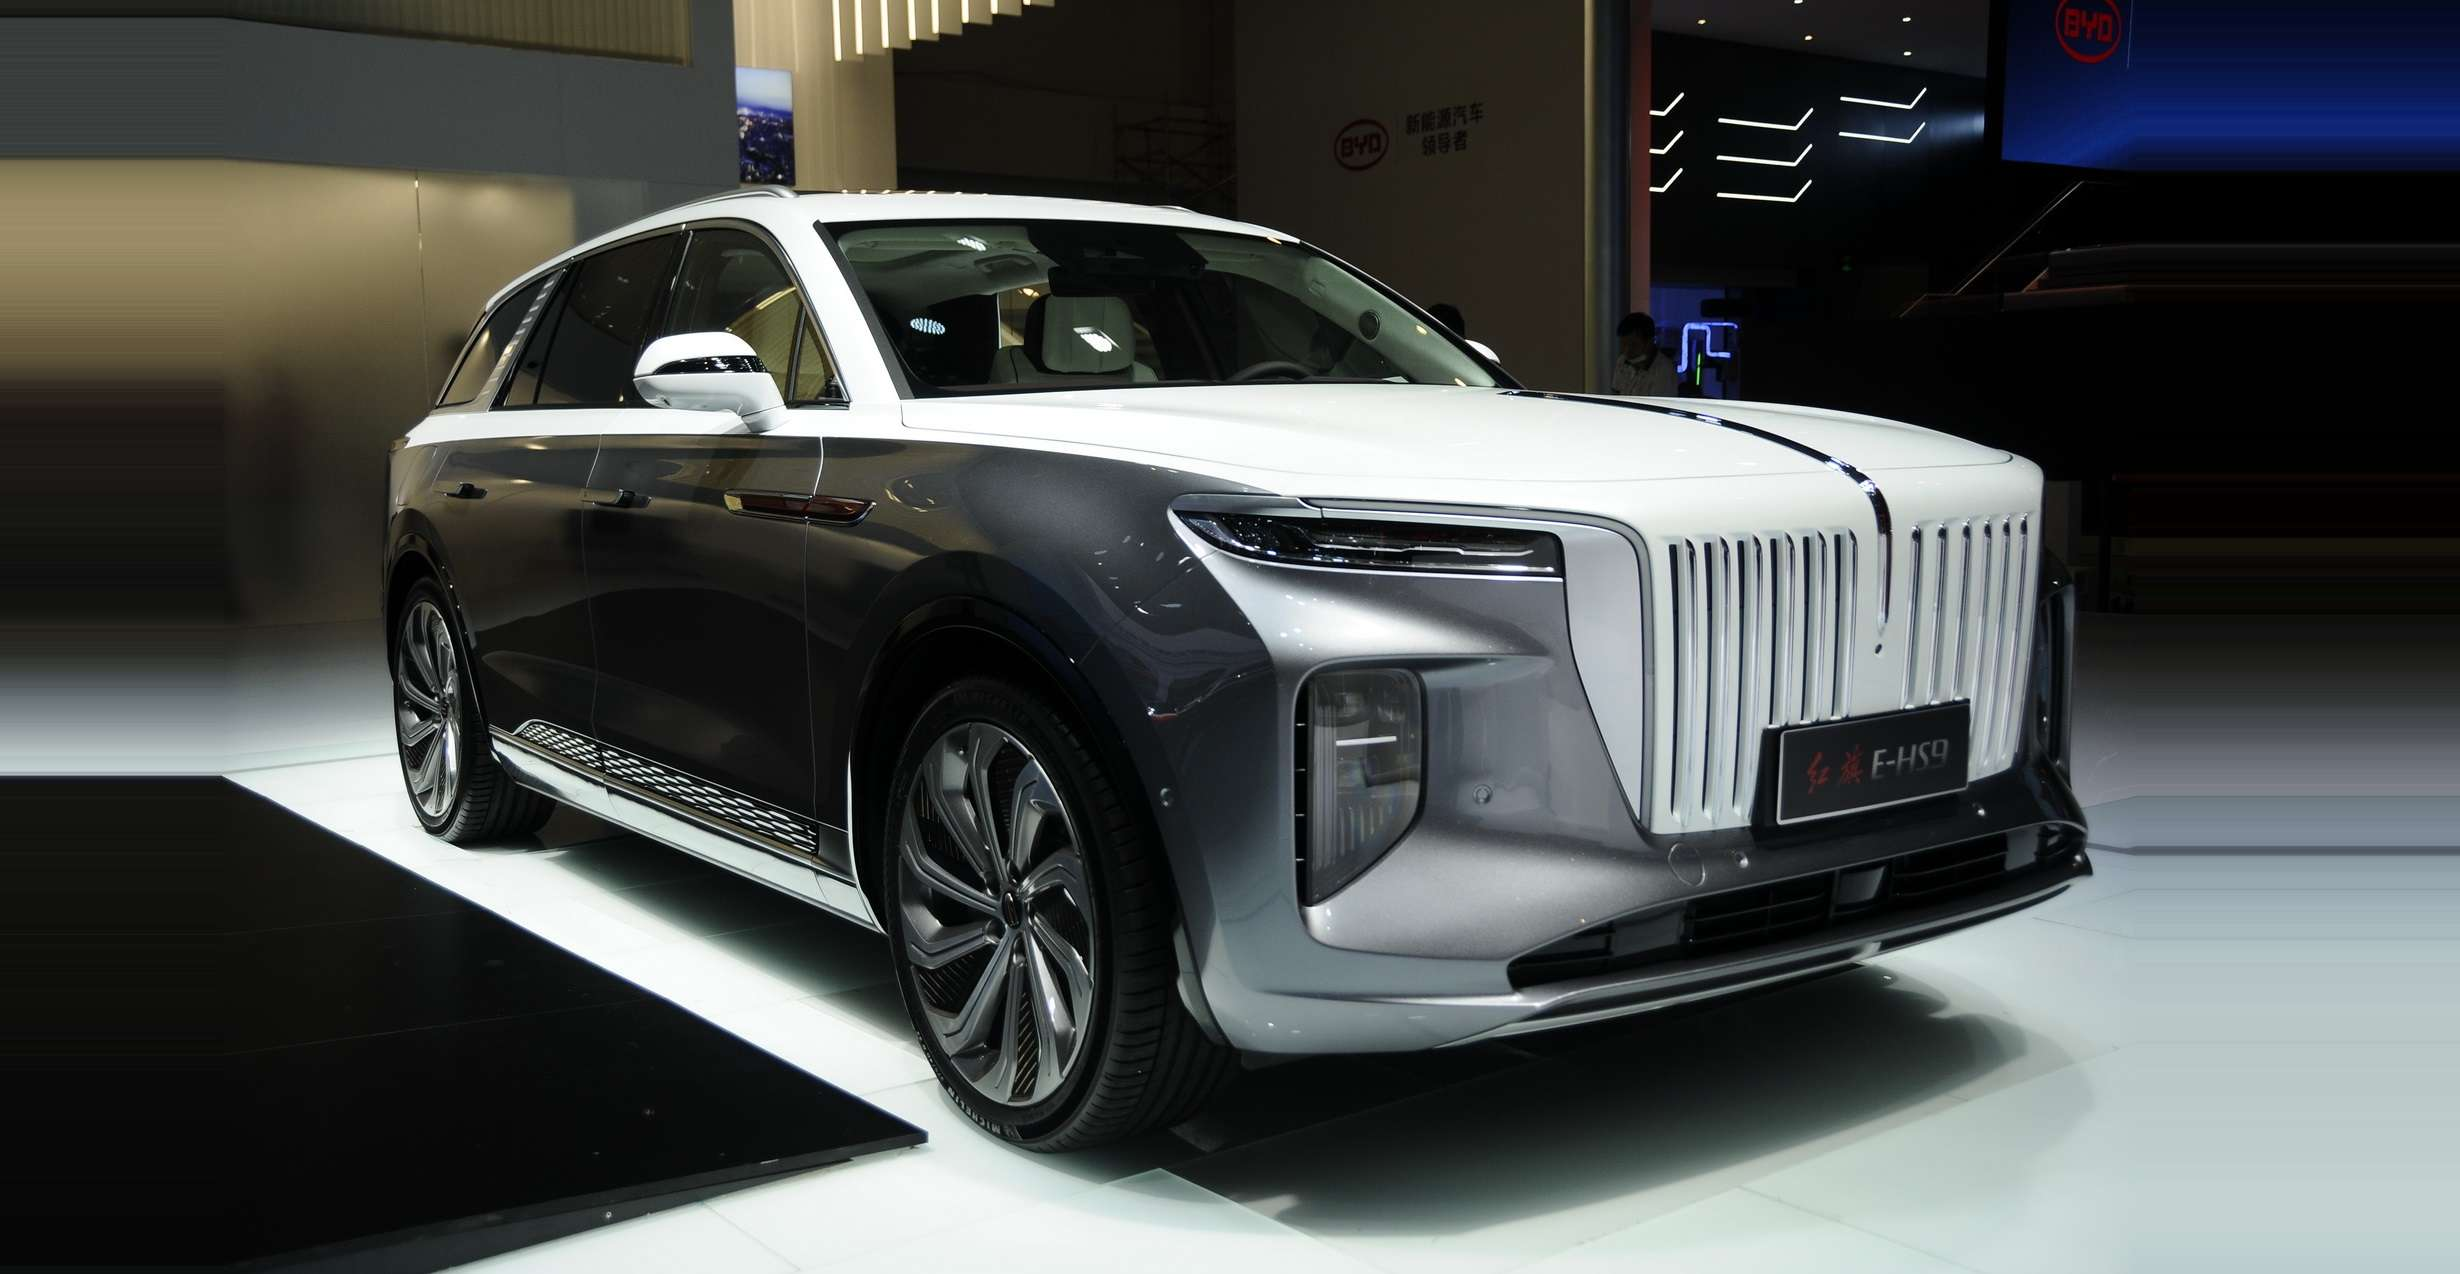 Kenalin Hongqi E Hs9 Mobil Mewah China Pakai Tenaga Listrik